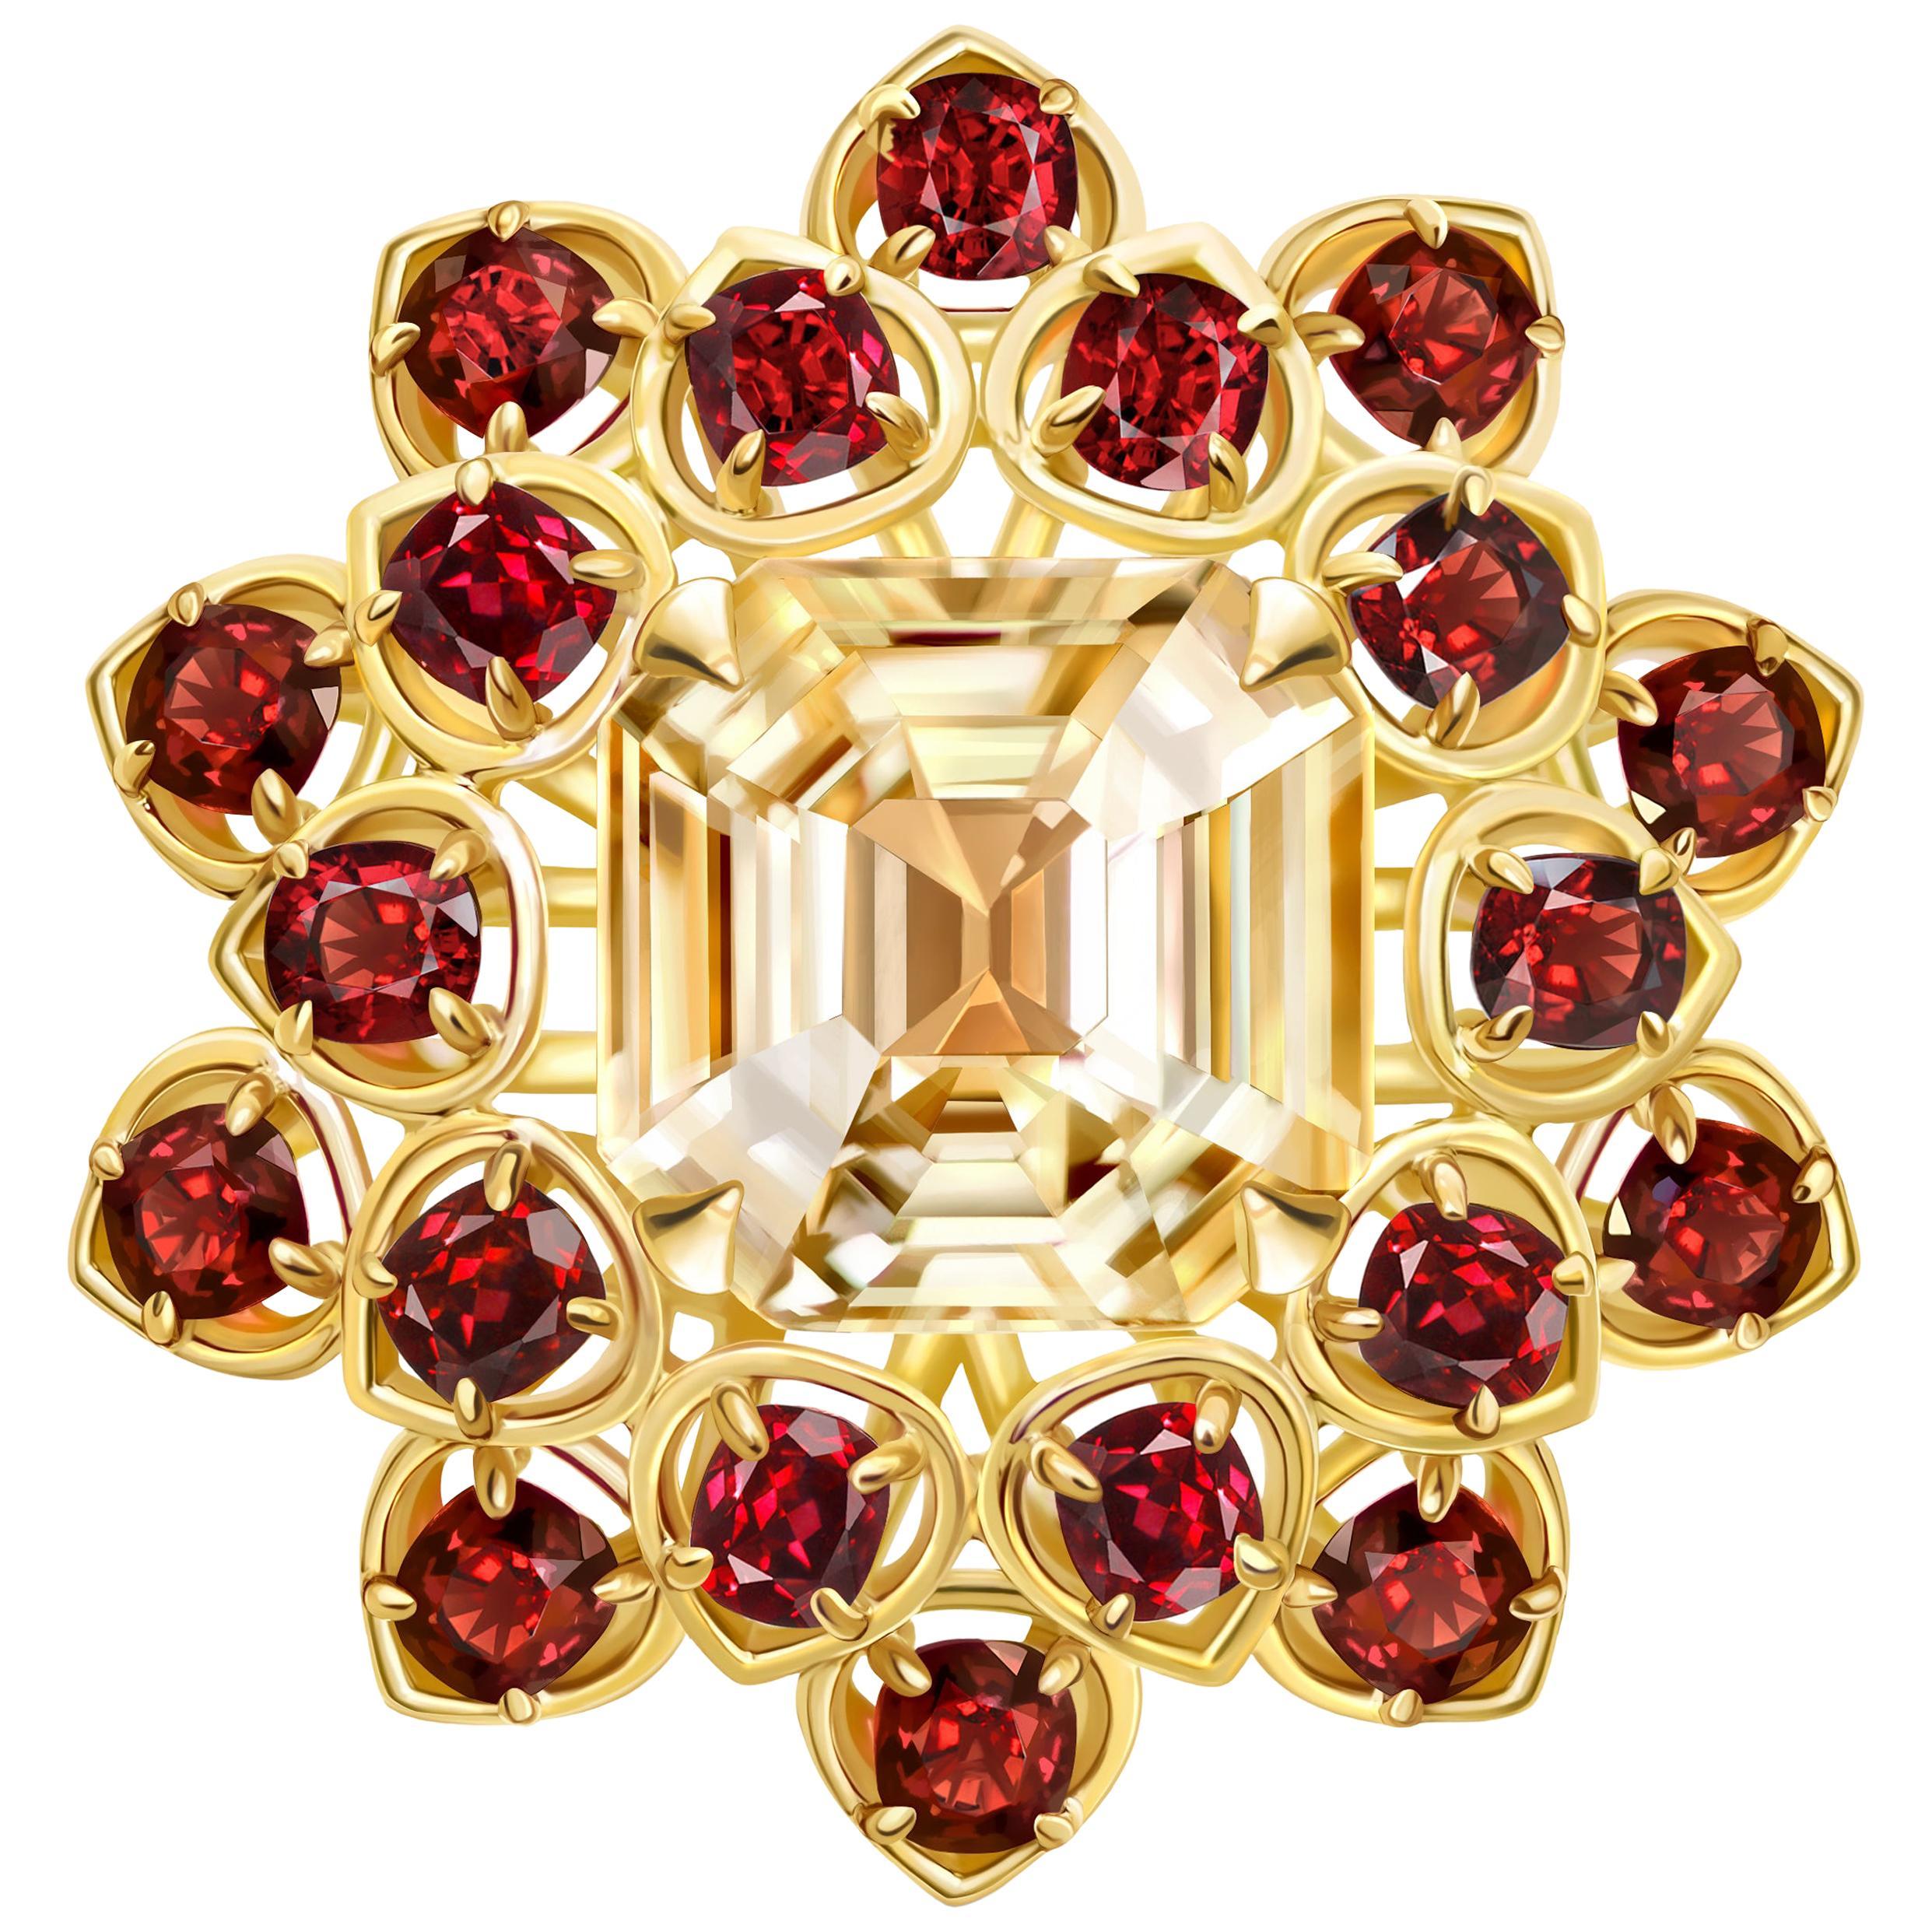 7.3 Carat Yellow Sapphire Red Spinel 18 Karat Yellow Gold Flower Cocktail Ring